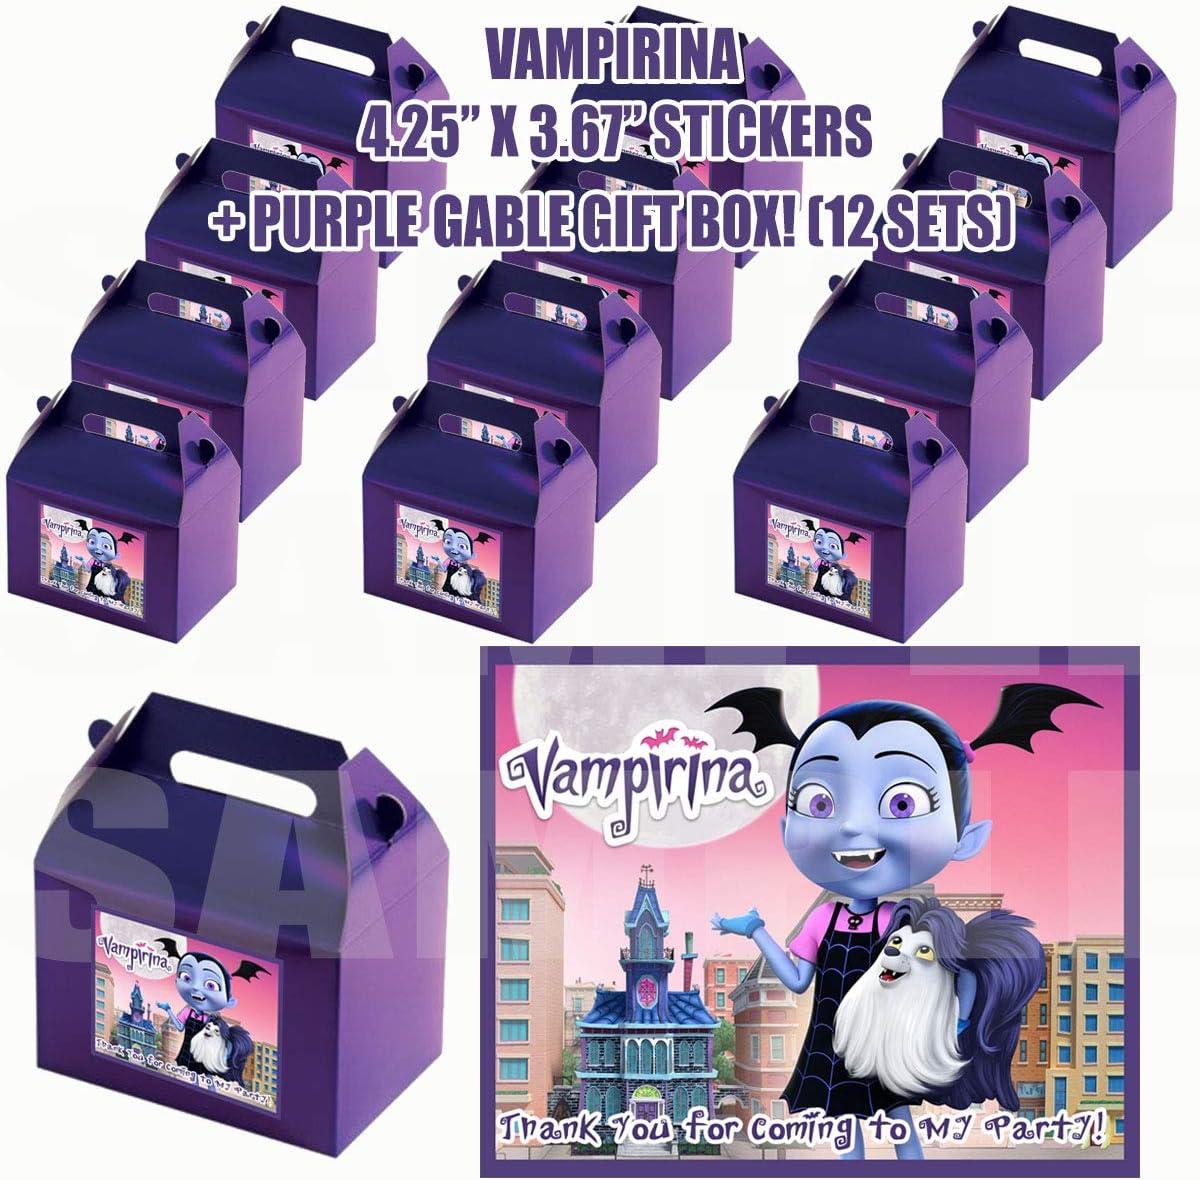 vampirina gift box sets, stickers